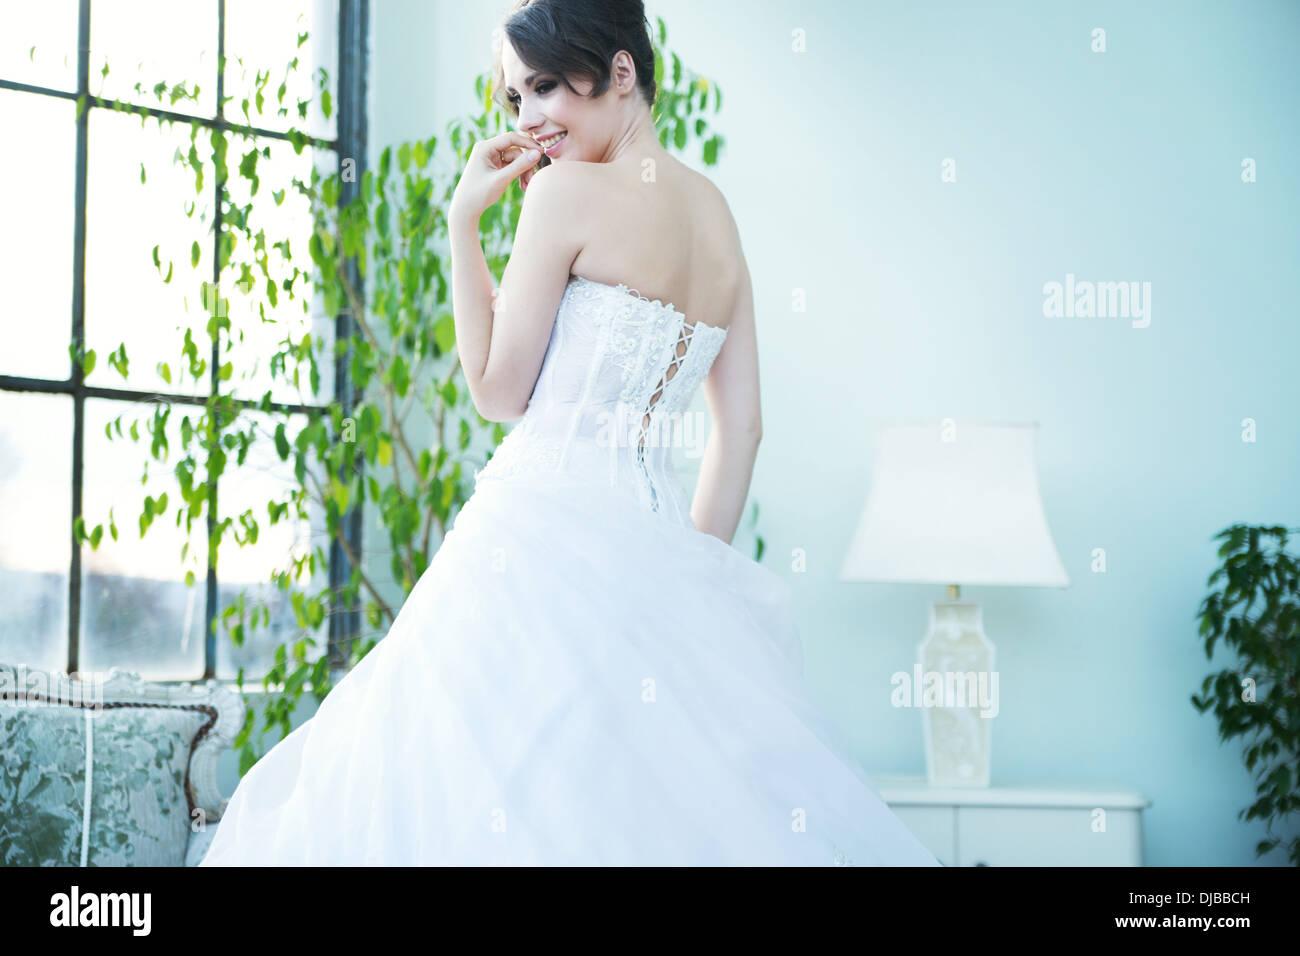 Mariée tentant attendant son mari bien-aimé Photo Stock